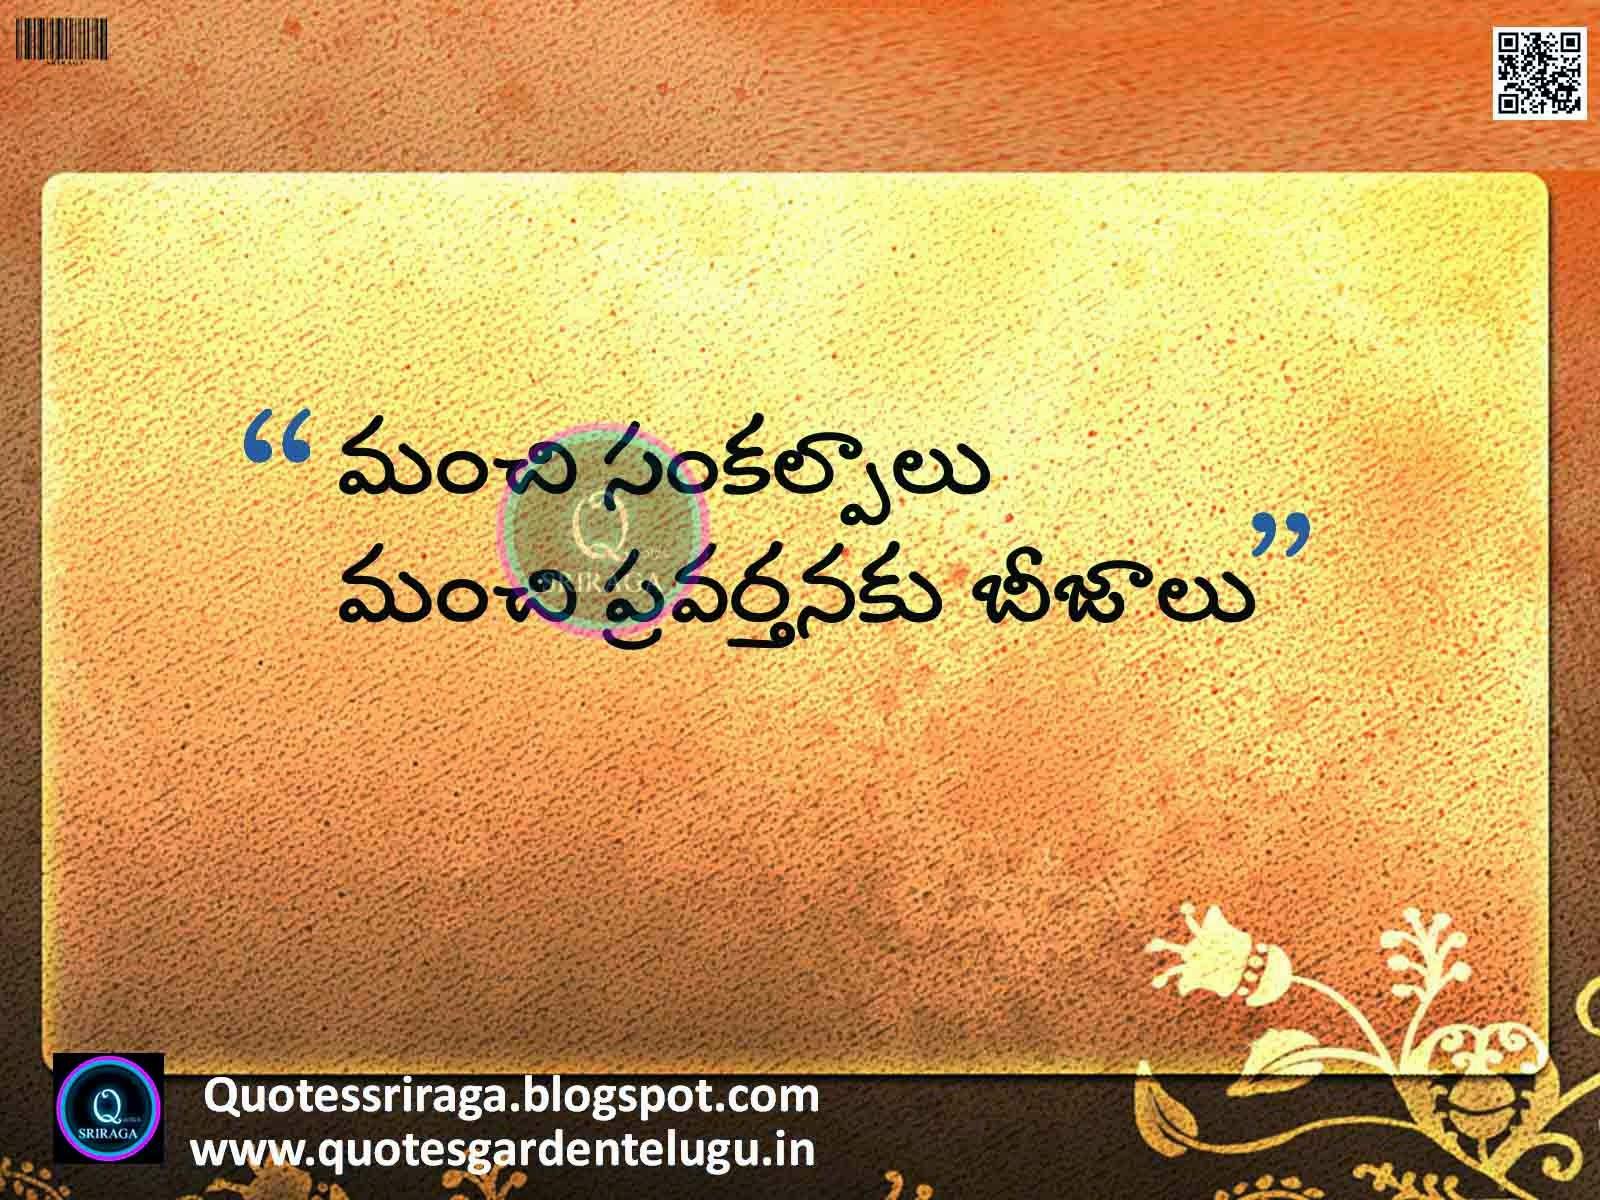 Best Telugu Good Reads Quotes 457 images